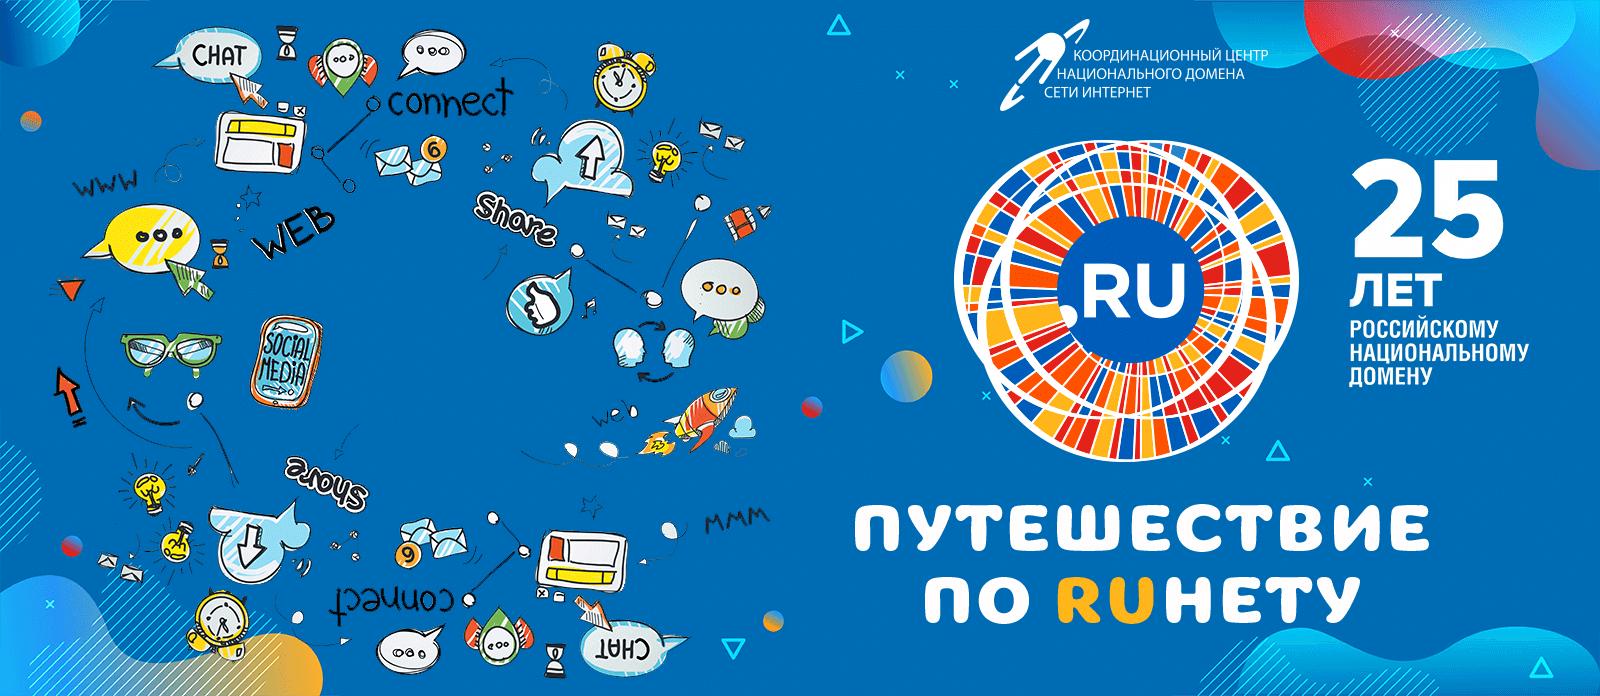 Конкурс: Путешествие по Ruнету